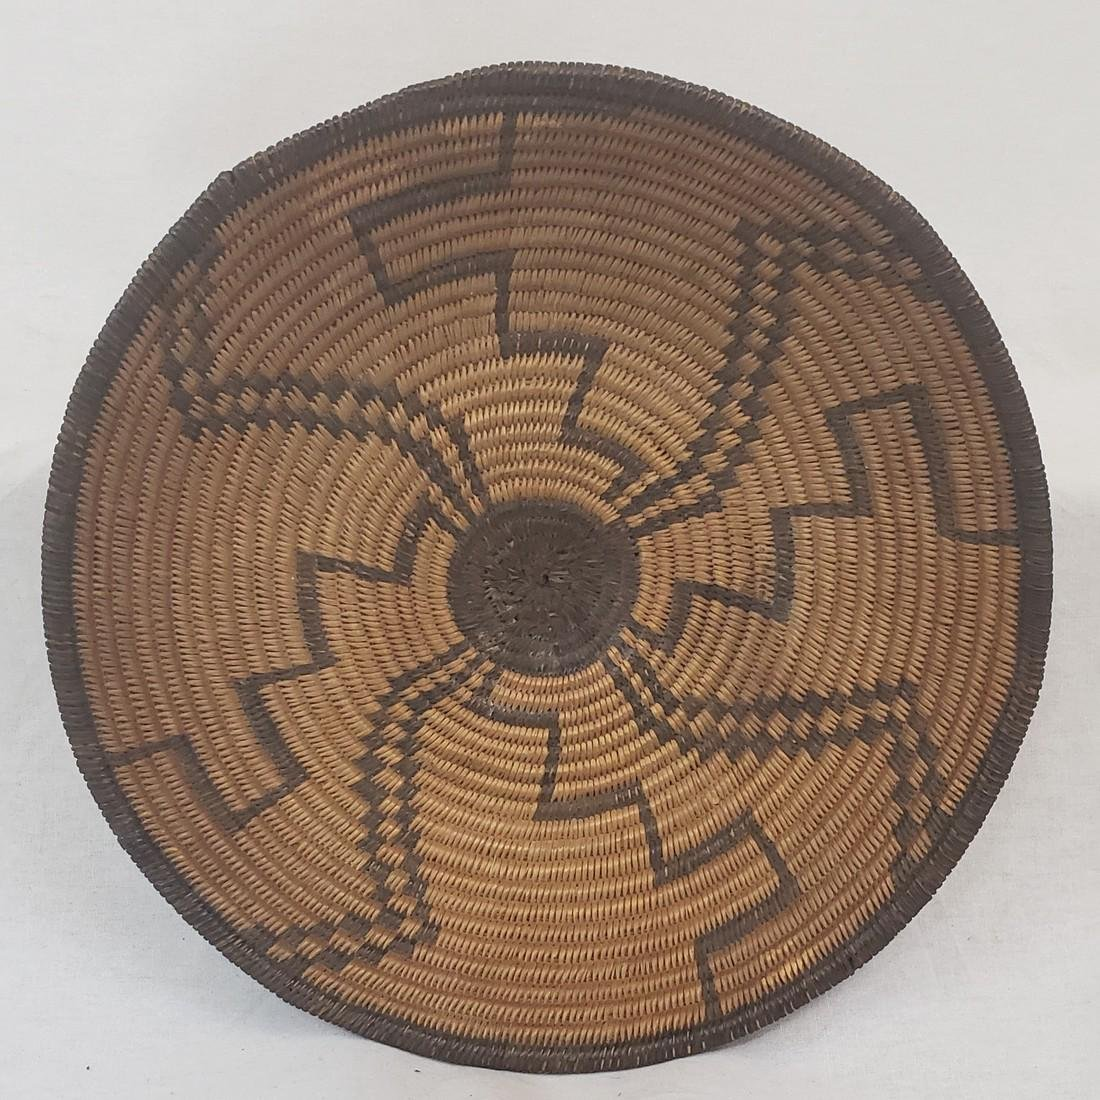 Fine Apache geometric basket ca 1900-1920